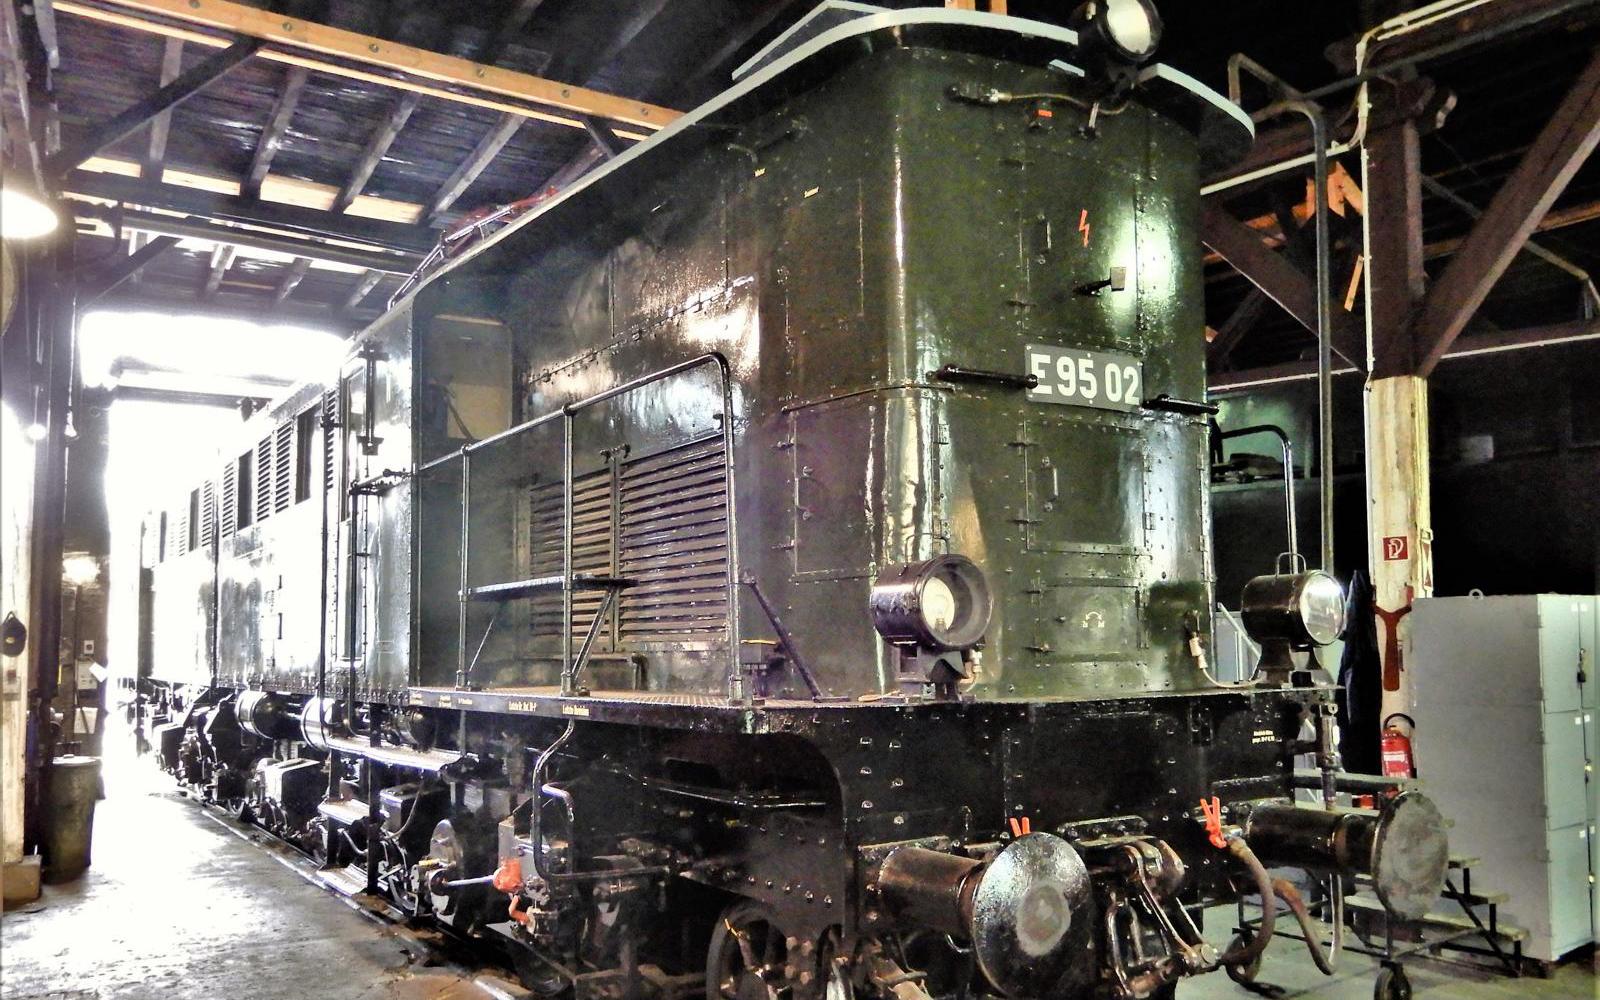 ©Foto: Christian Wodzinski | railmen | Im Lokschuppen des DB Museums Halle | Güterzuglokomotive E95 02